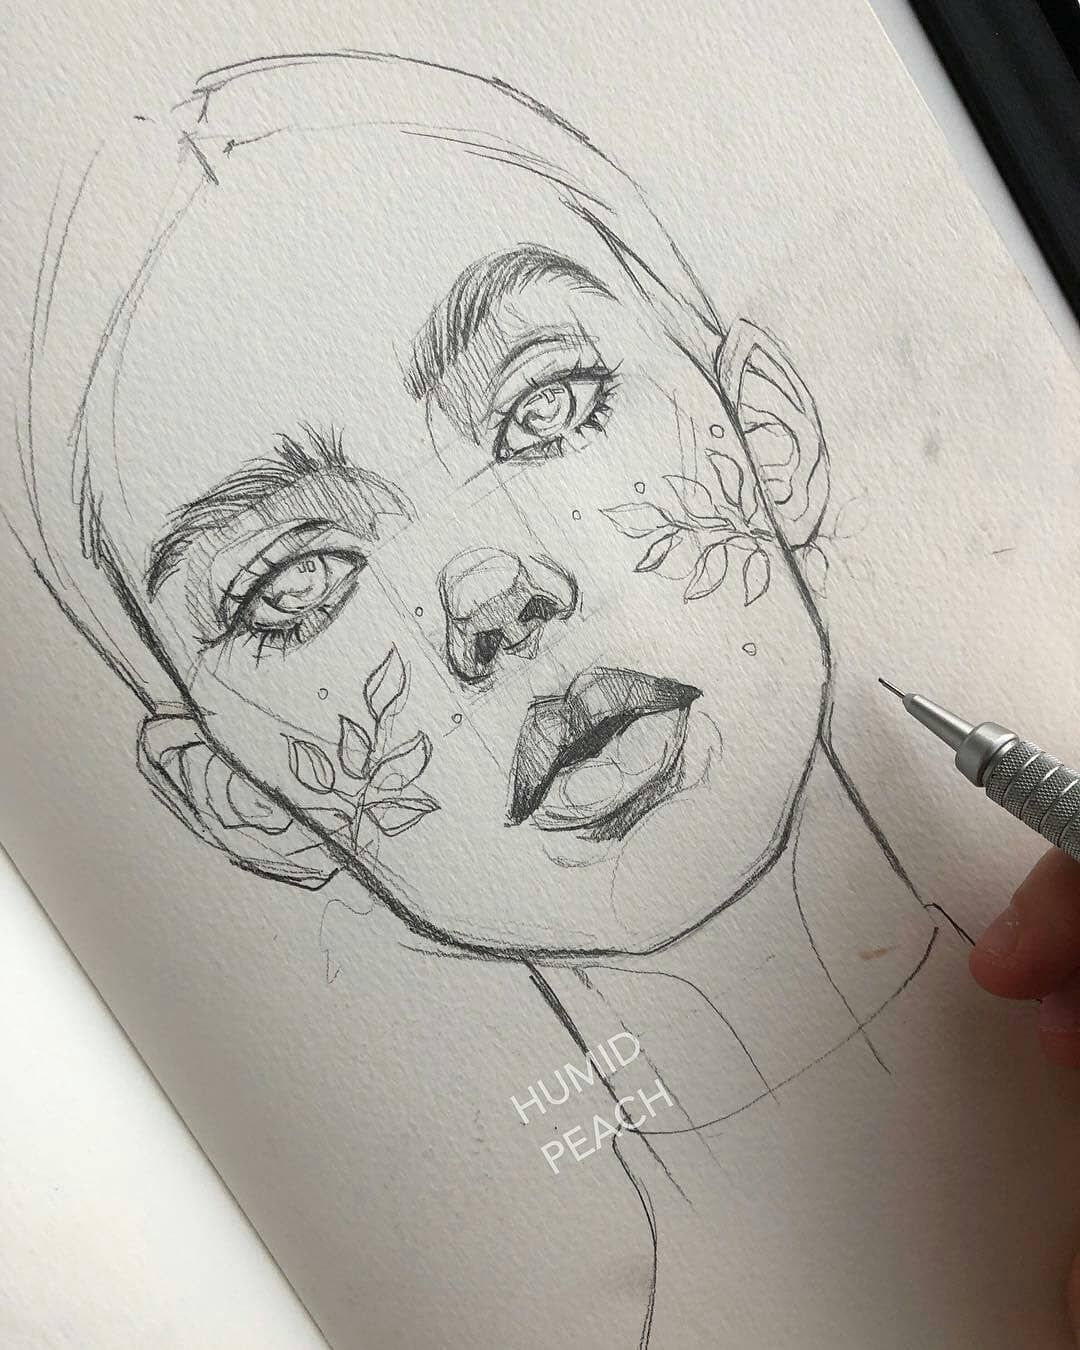 Pin Oleh Sebastian Pardo Di Drawing And Painting Cara Menggambar Sketsa Gambar Realistis